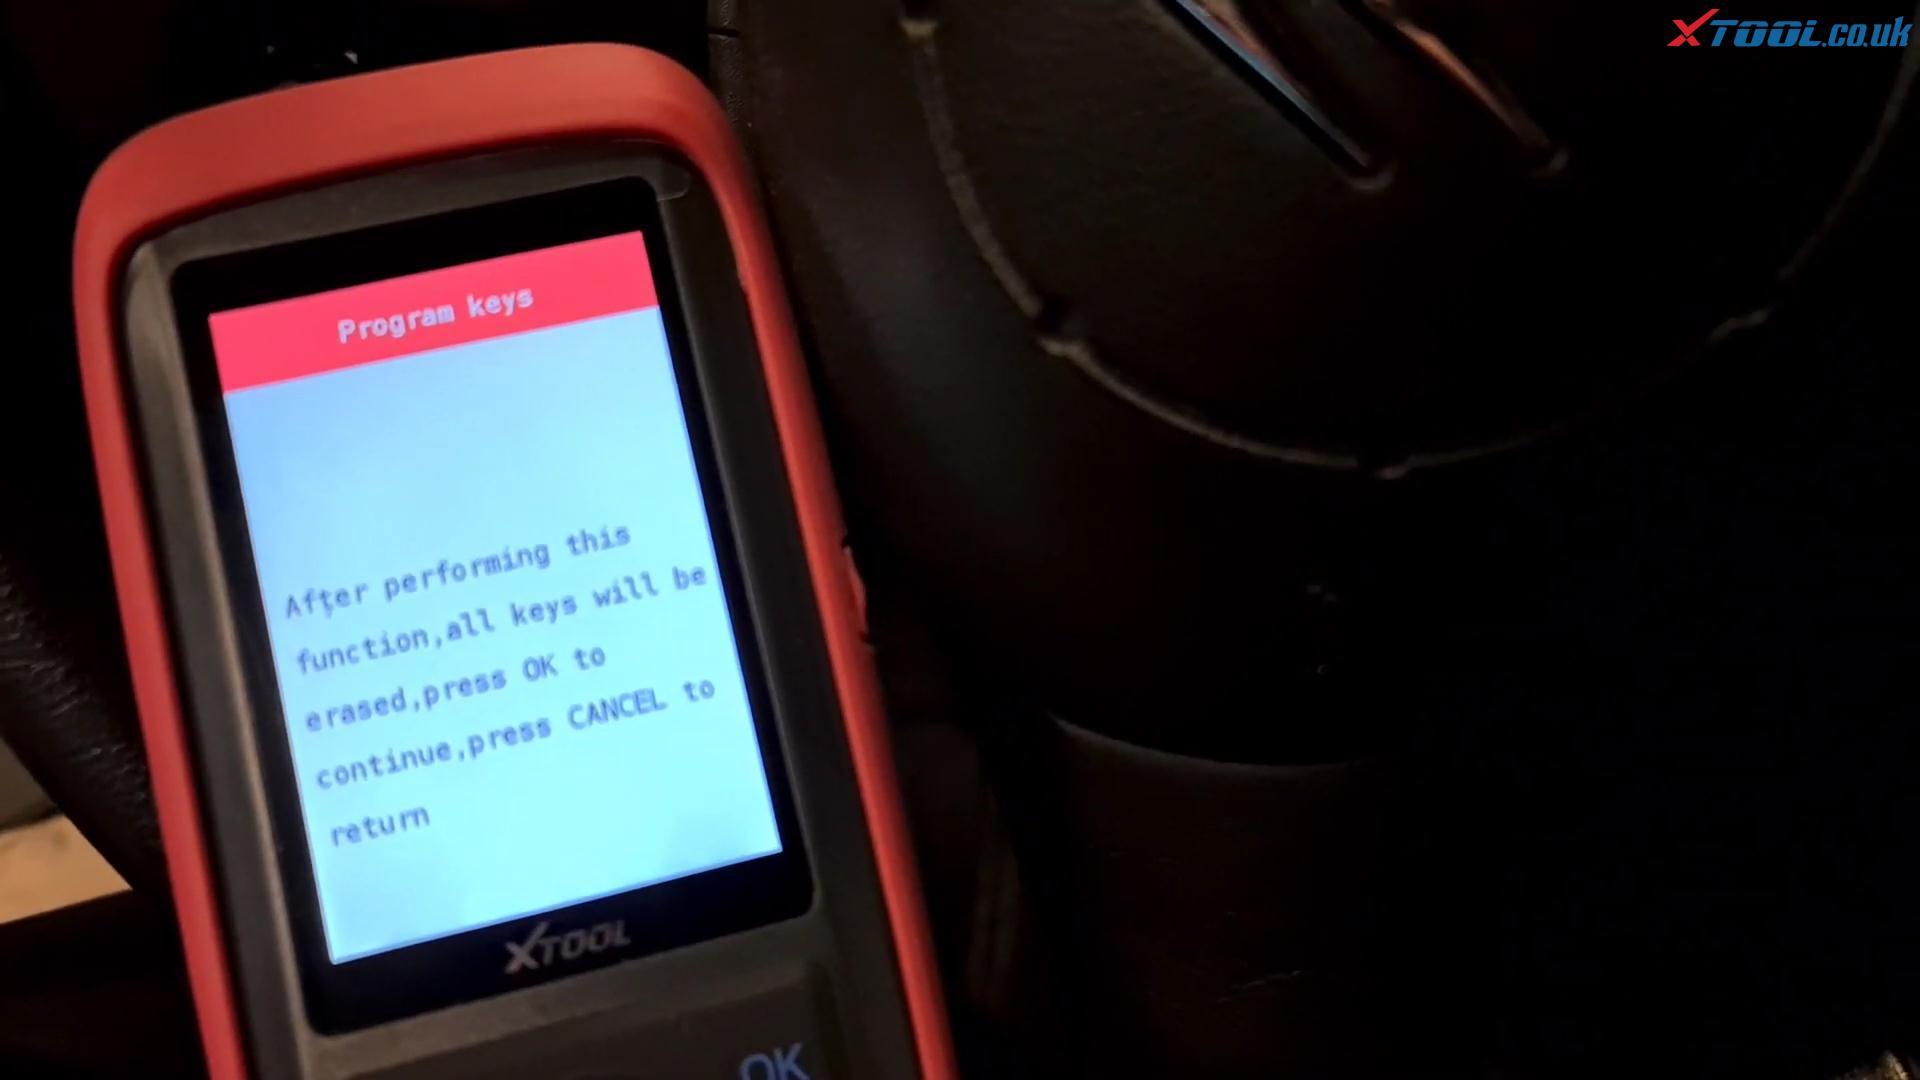 xtool-x100-pro2-program-key-2005-citroen-c2-1.1l-08